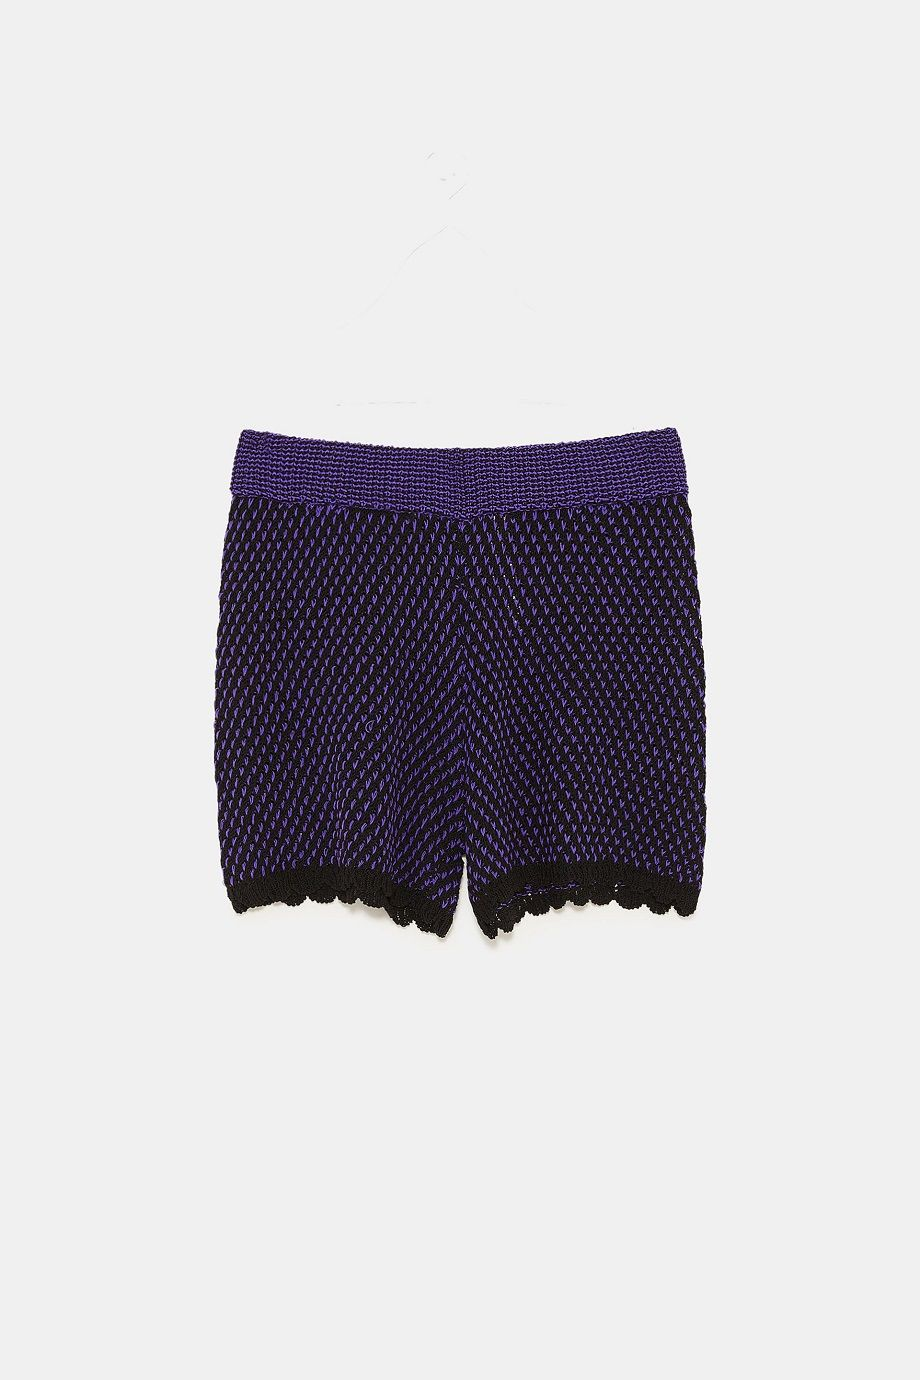 5 Model Short Pants yang Keren untuk Dipakai Sehari-hari